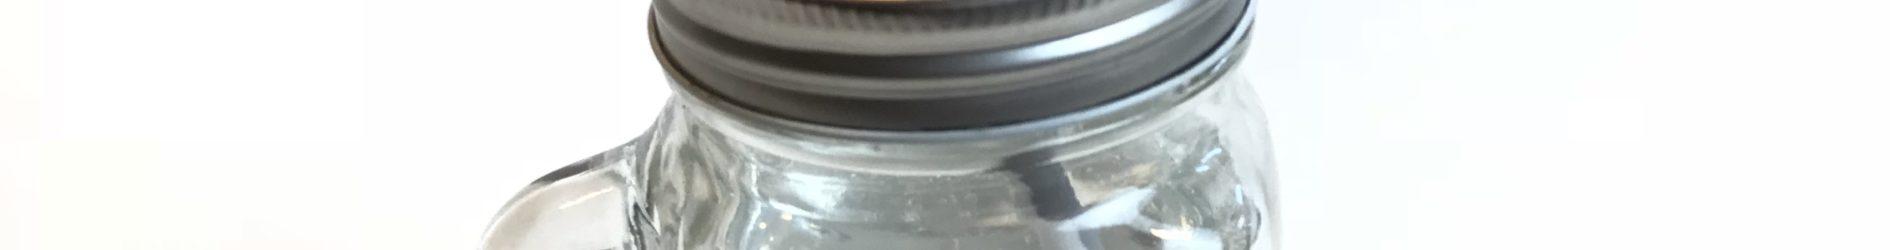 Etched Mason Drinking Jar